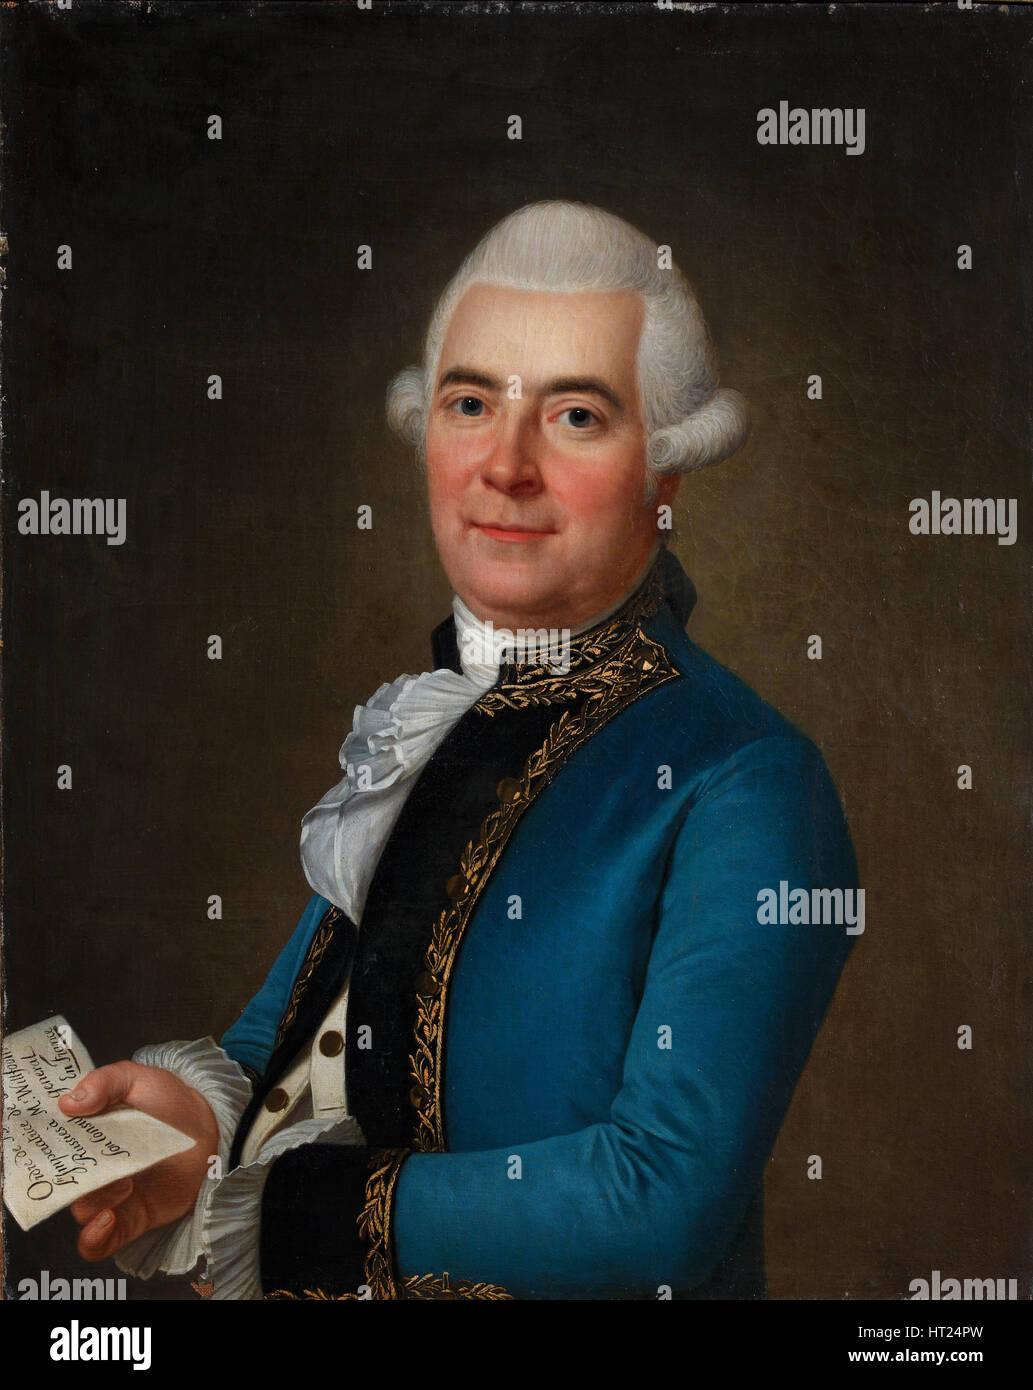 Portrait of Arvid Wittfooth, 1789. Artist: Wertmüller, Adolf Ulrik (1751-1811) - Stock Image